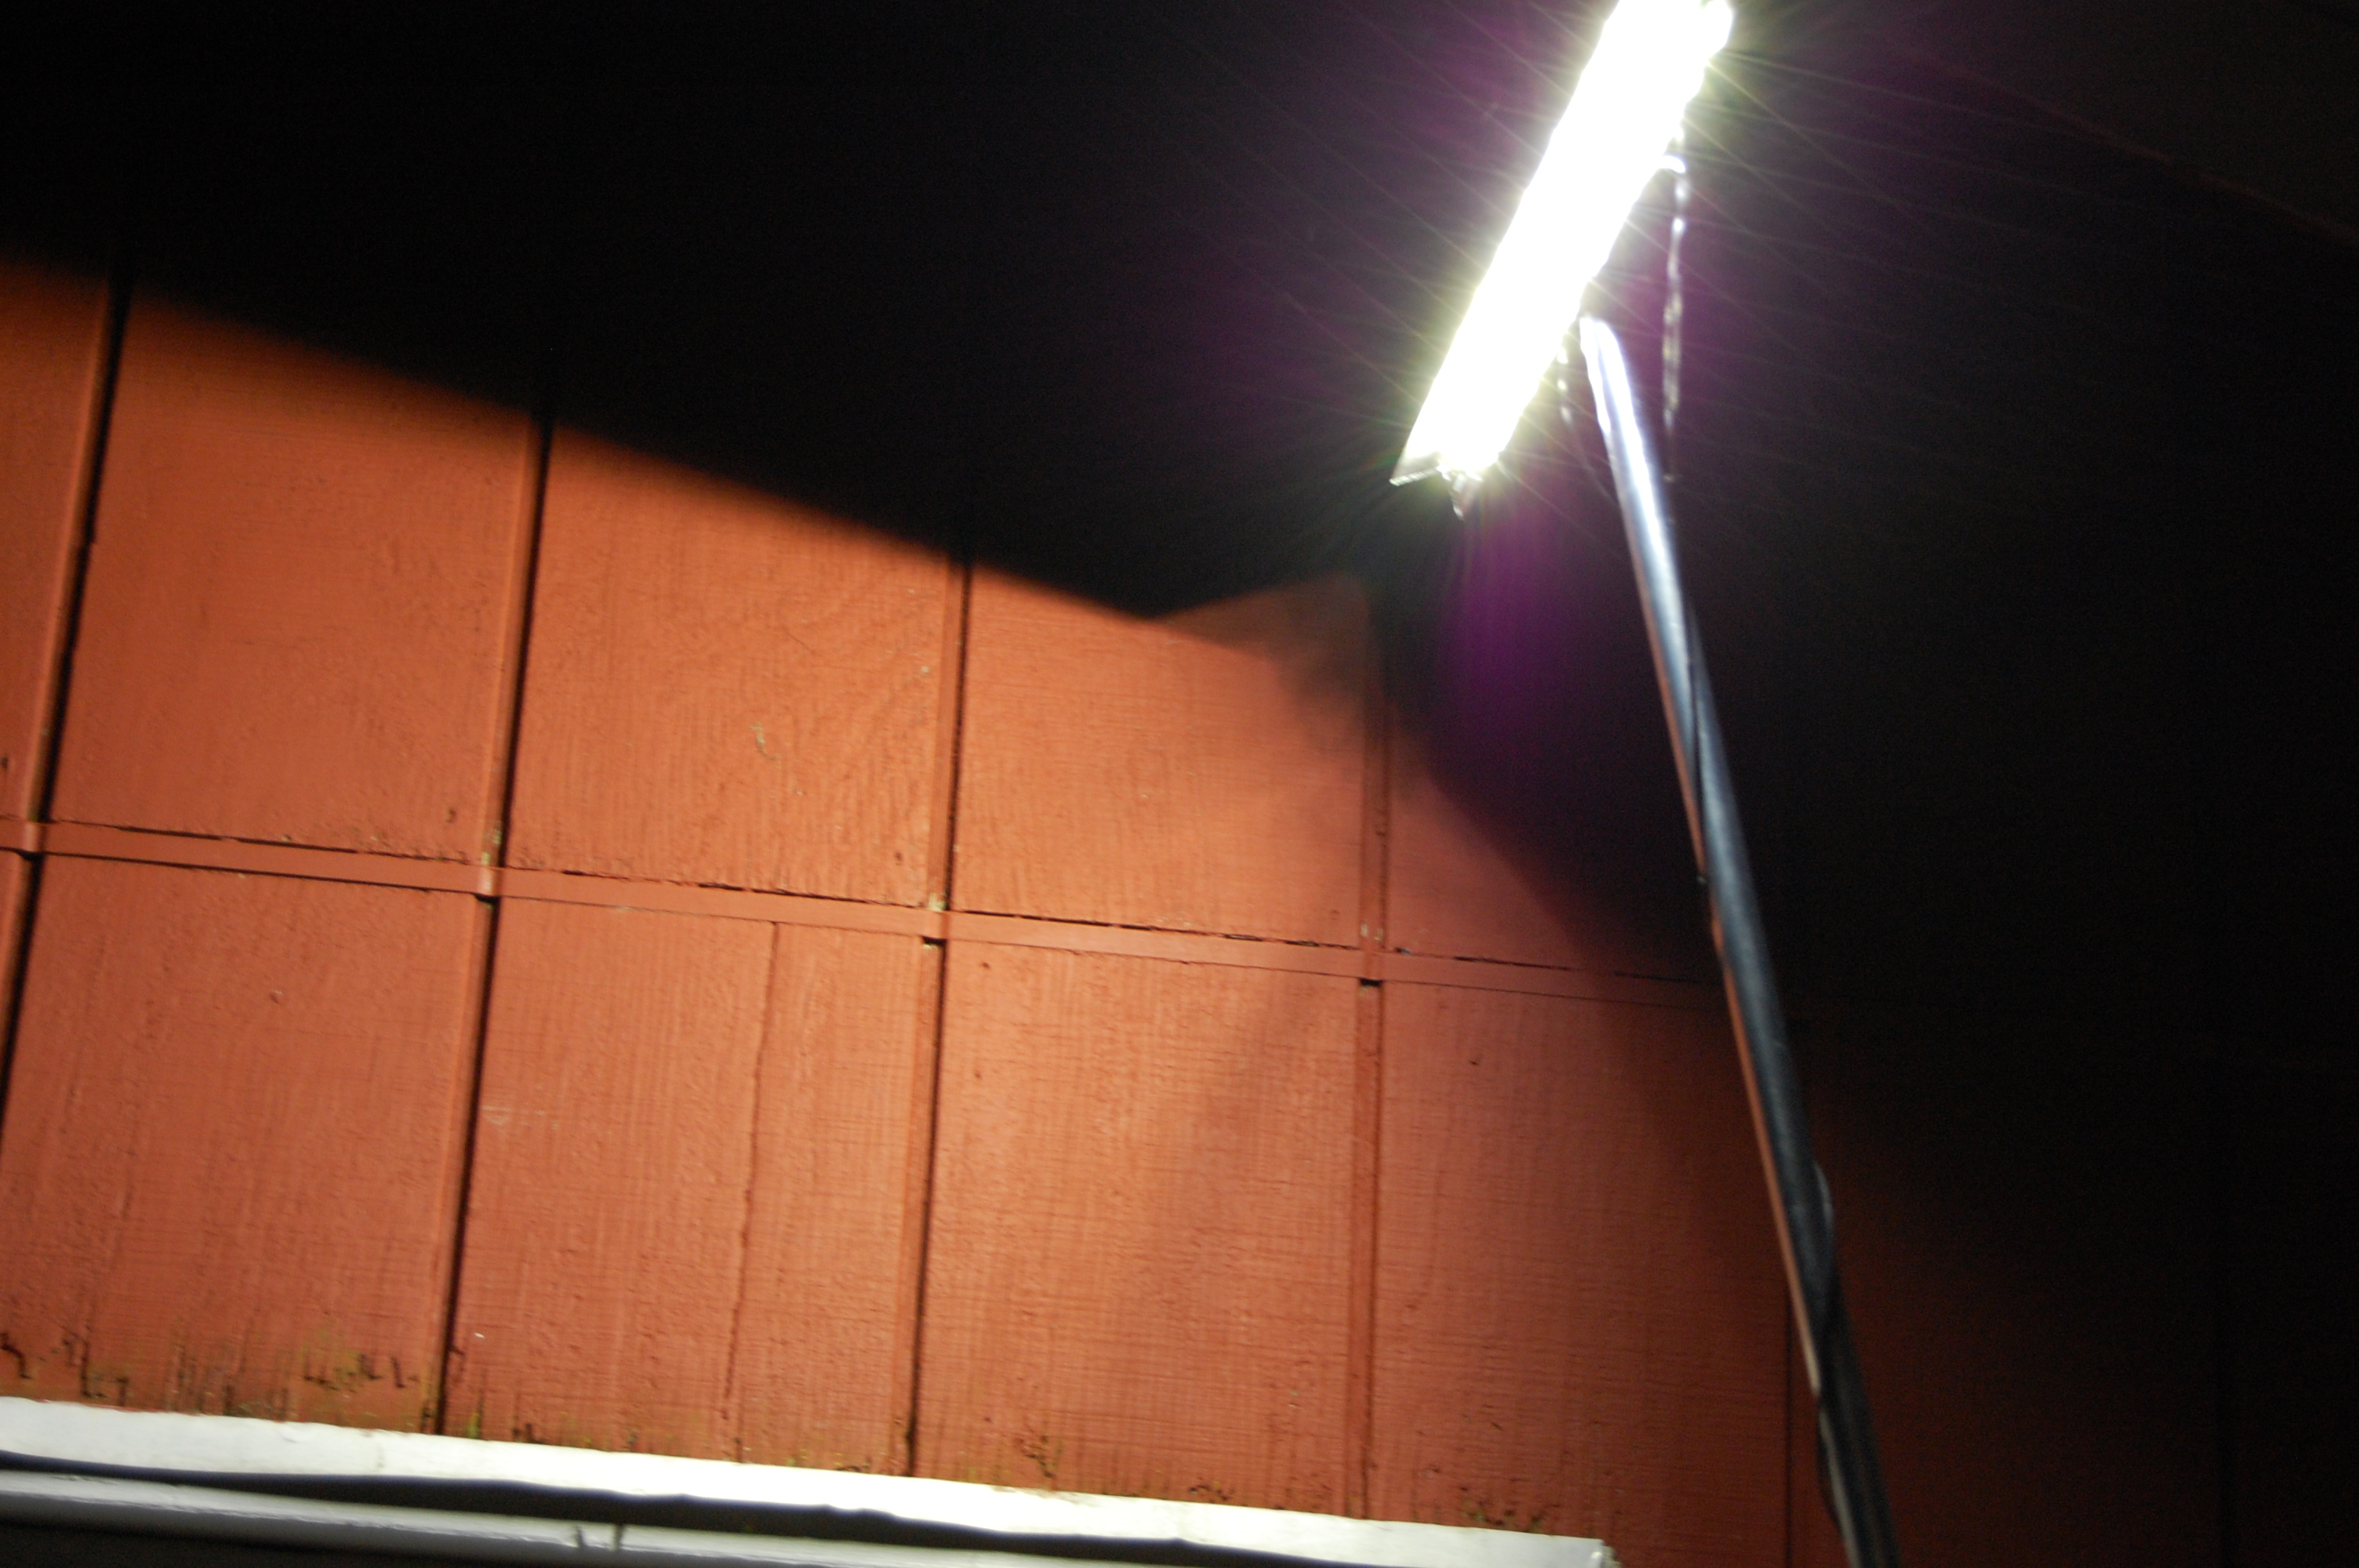 36 Volt - 900 Lumen LED Stadium Lights